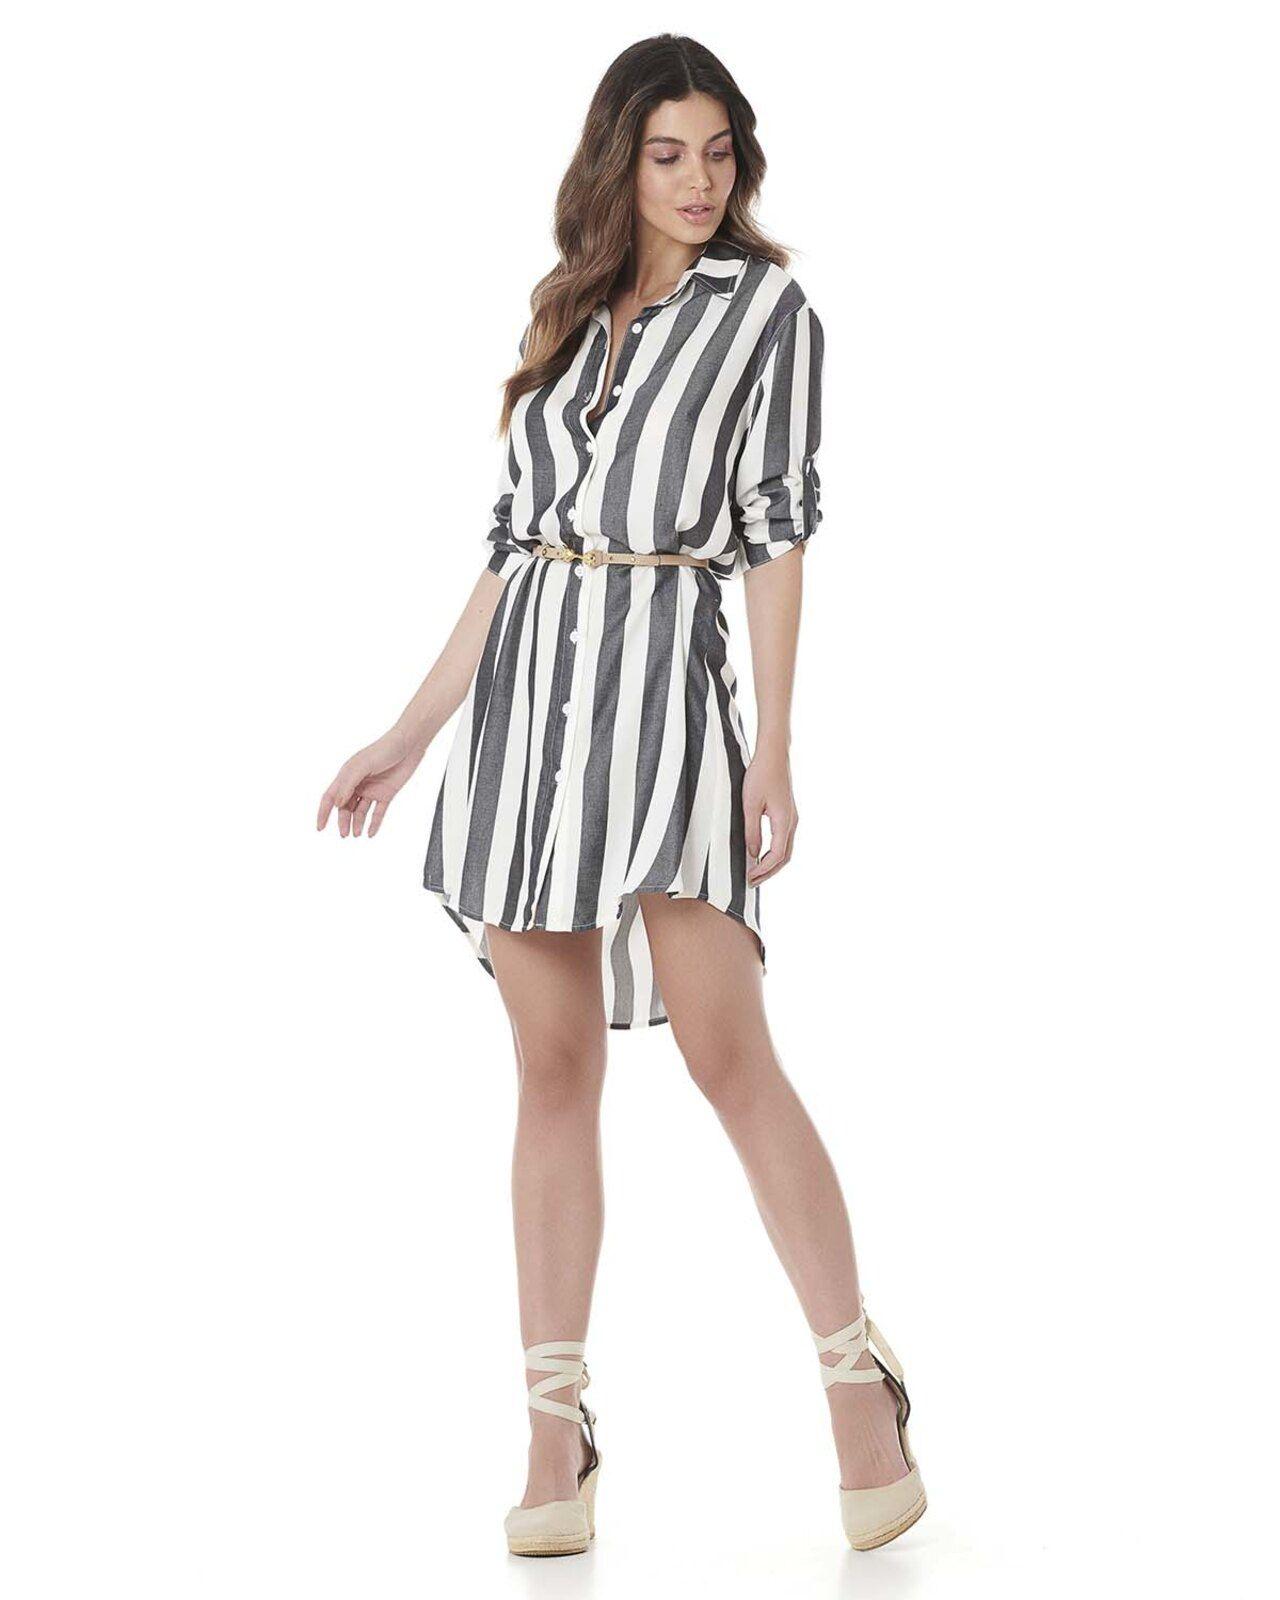 Vestido Serinah Tipo Camisa Listrado Moda Em 2019 Camisa